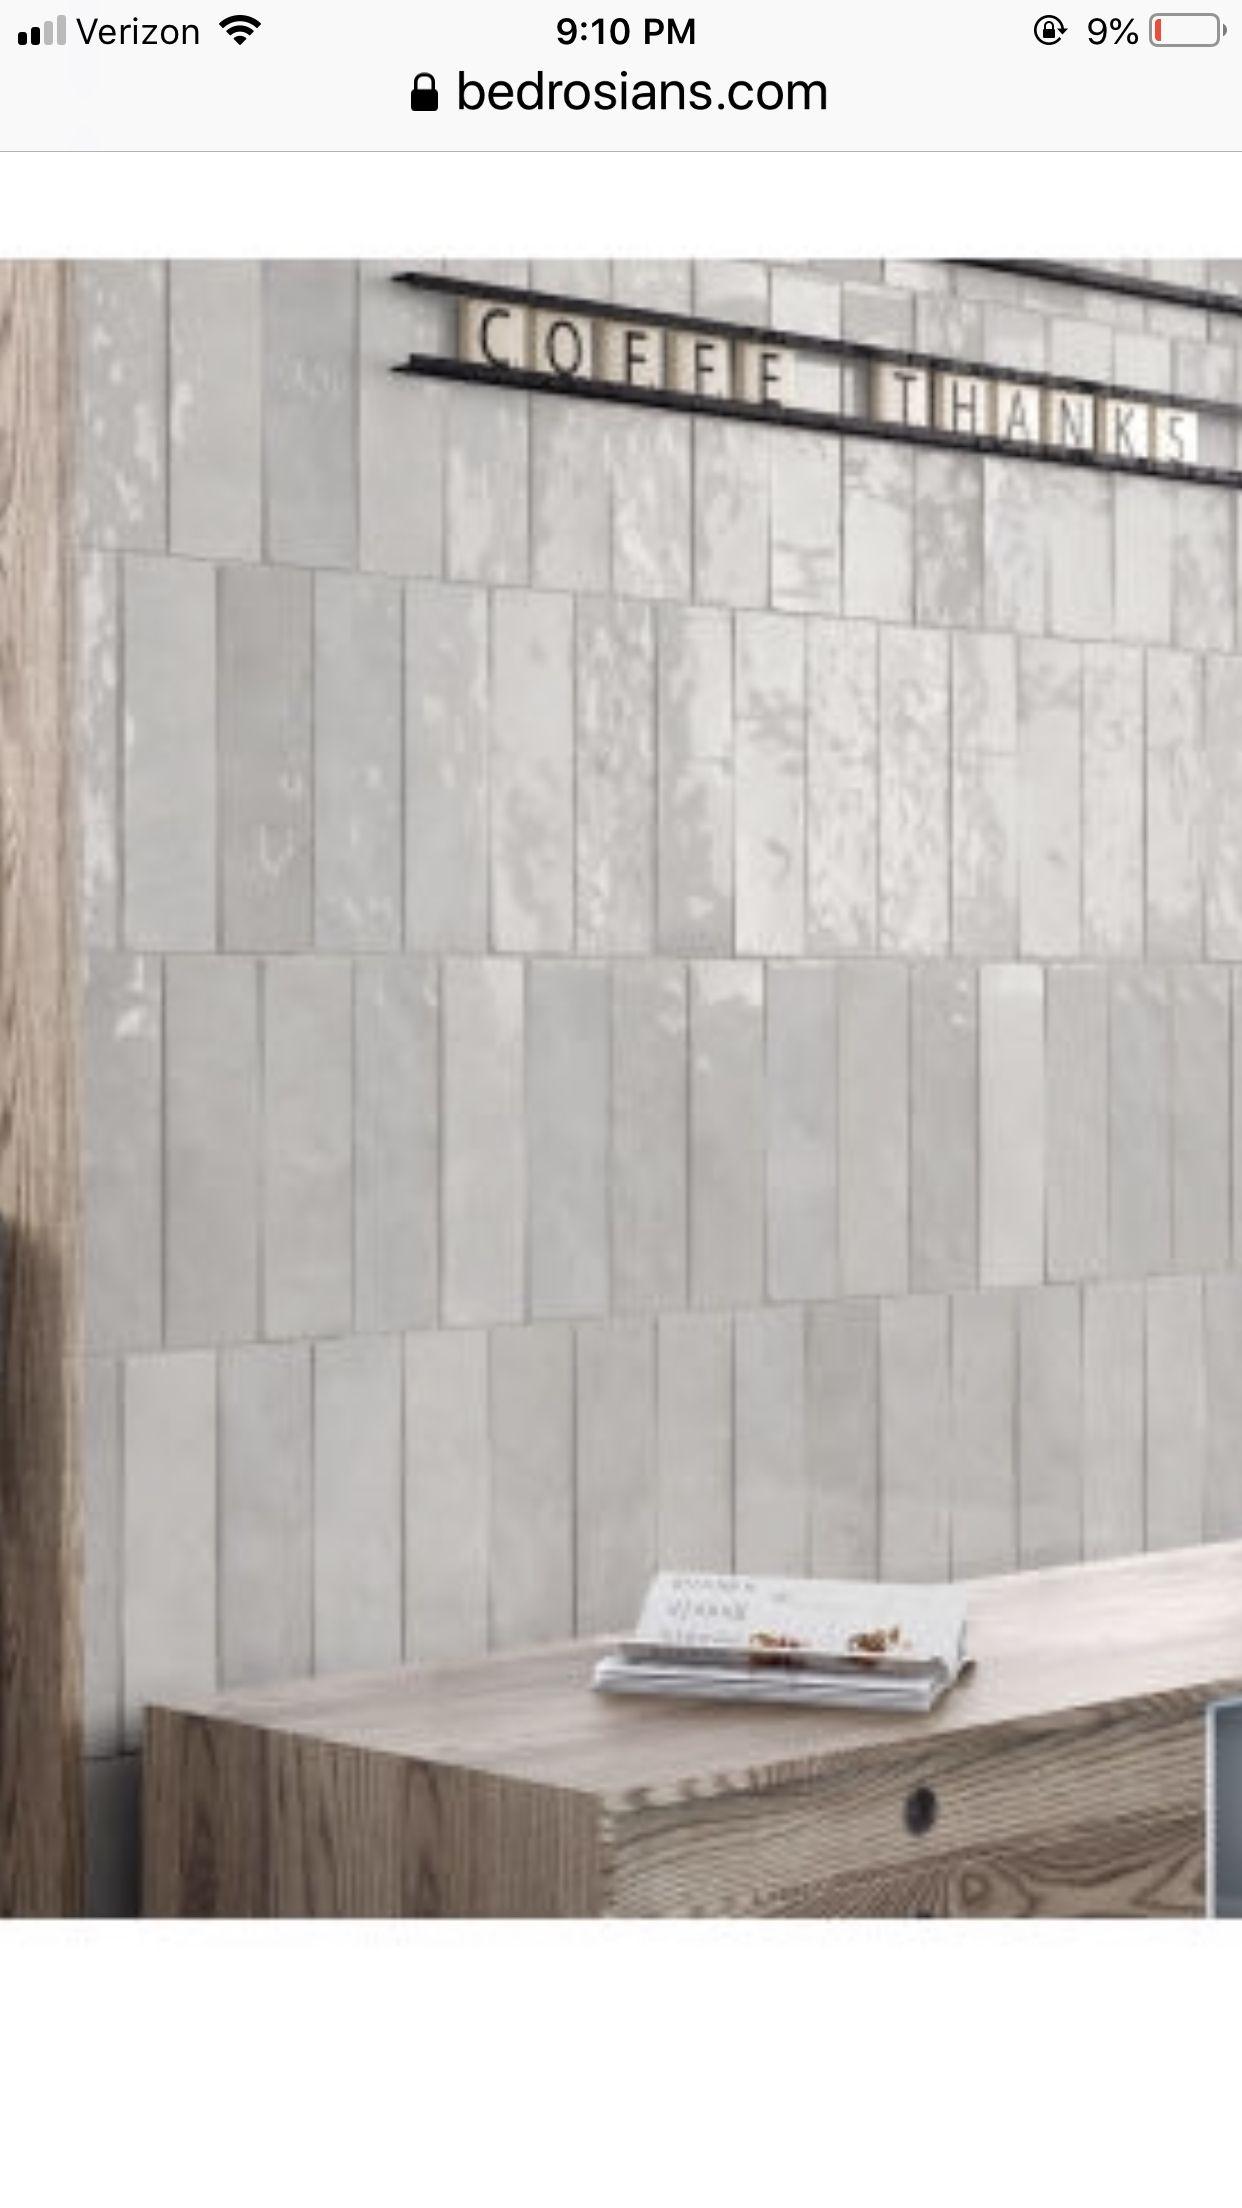 Bedrosian Tile Cloe Gray 2x8 Bathroom Inspiration Bath